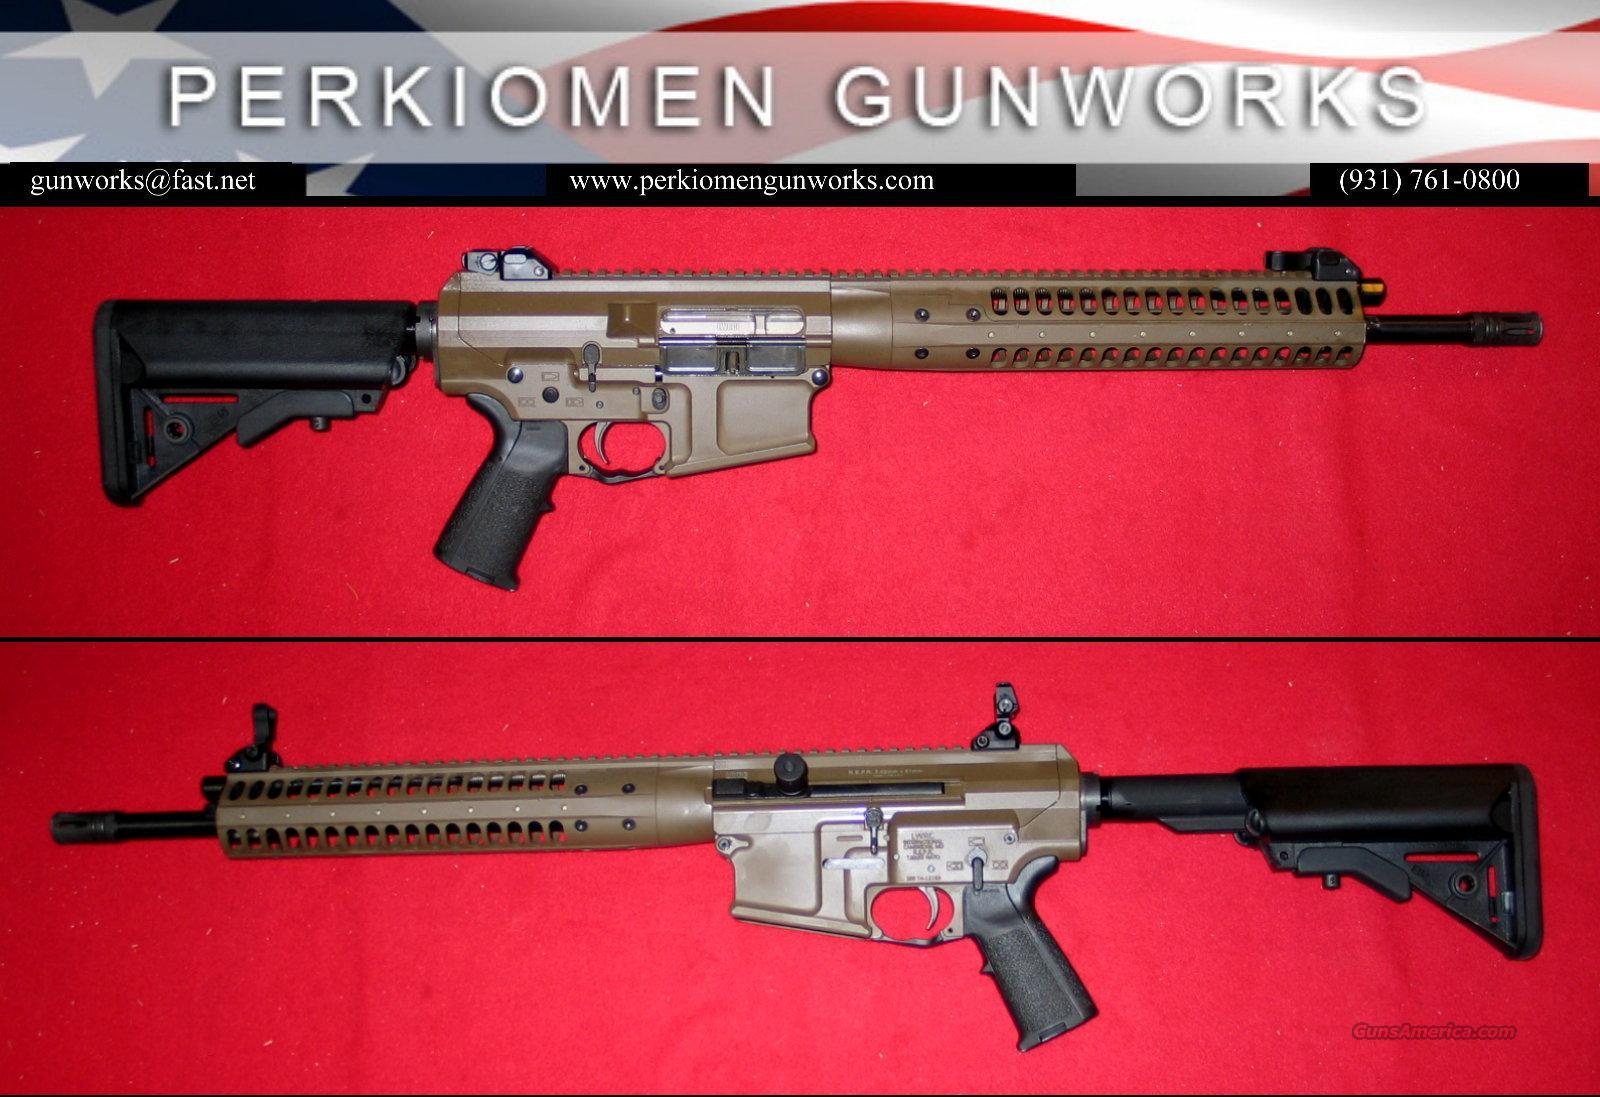 "LWRC REPR 7.62/.308 16.1"" Patriot Brown - New in Box  Guns > Rifles > AR-15 Rifles - Small Manufacturers > Complete Rifle"